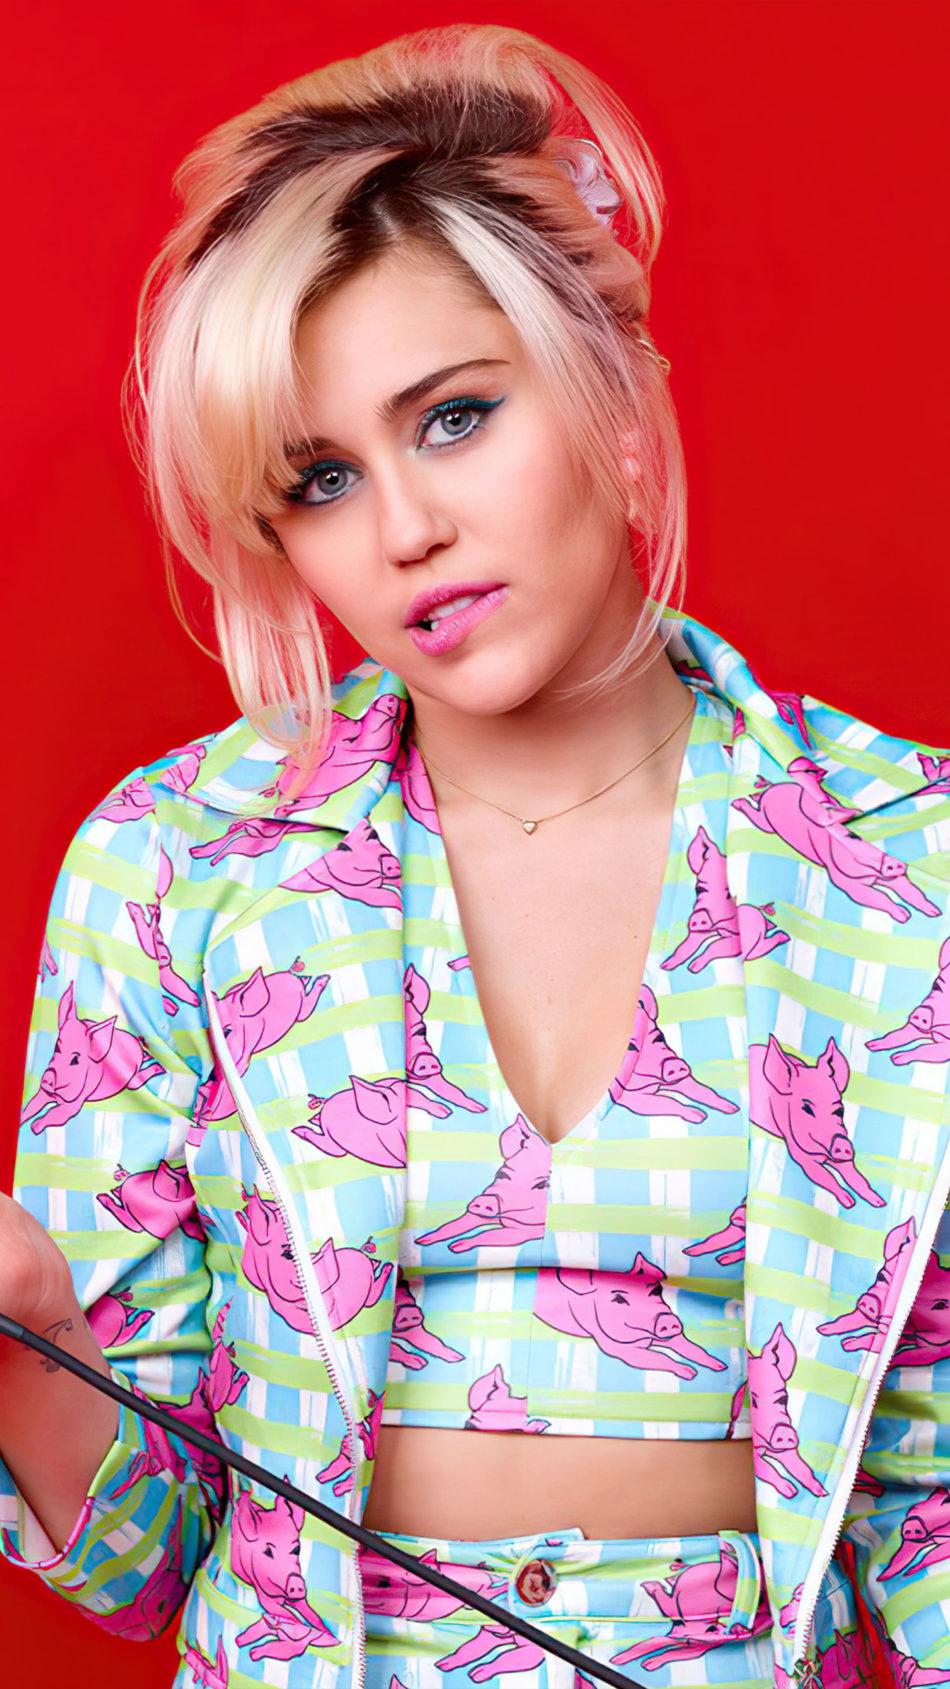 Miley Cyrus Billboard 2020 4K Ultra HD Mobile Wallpaper